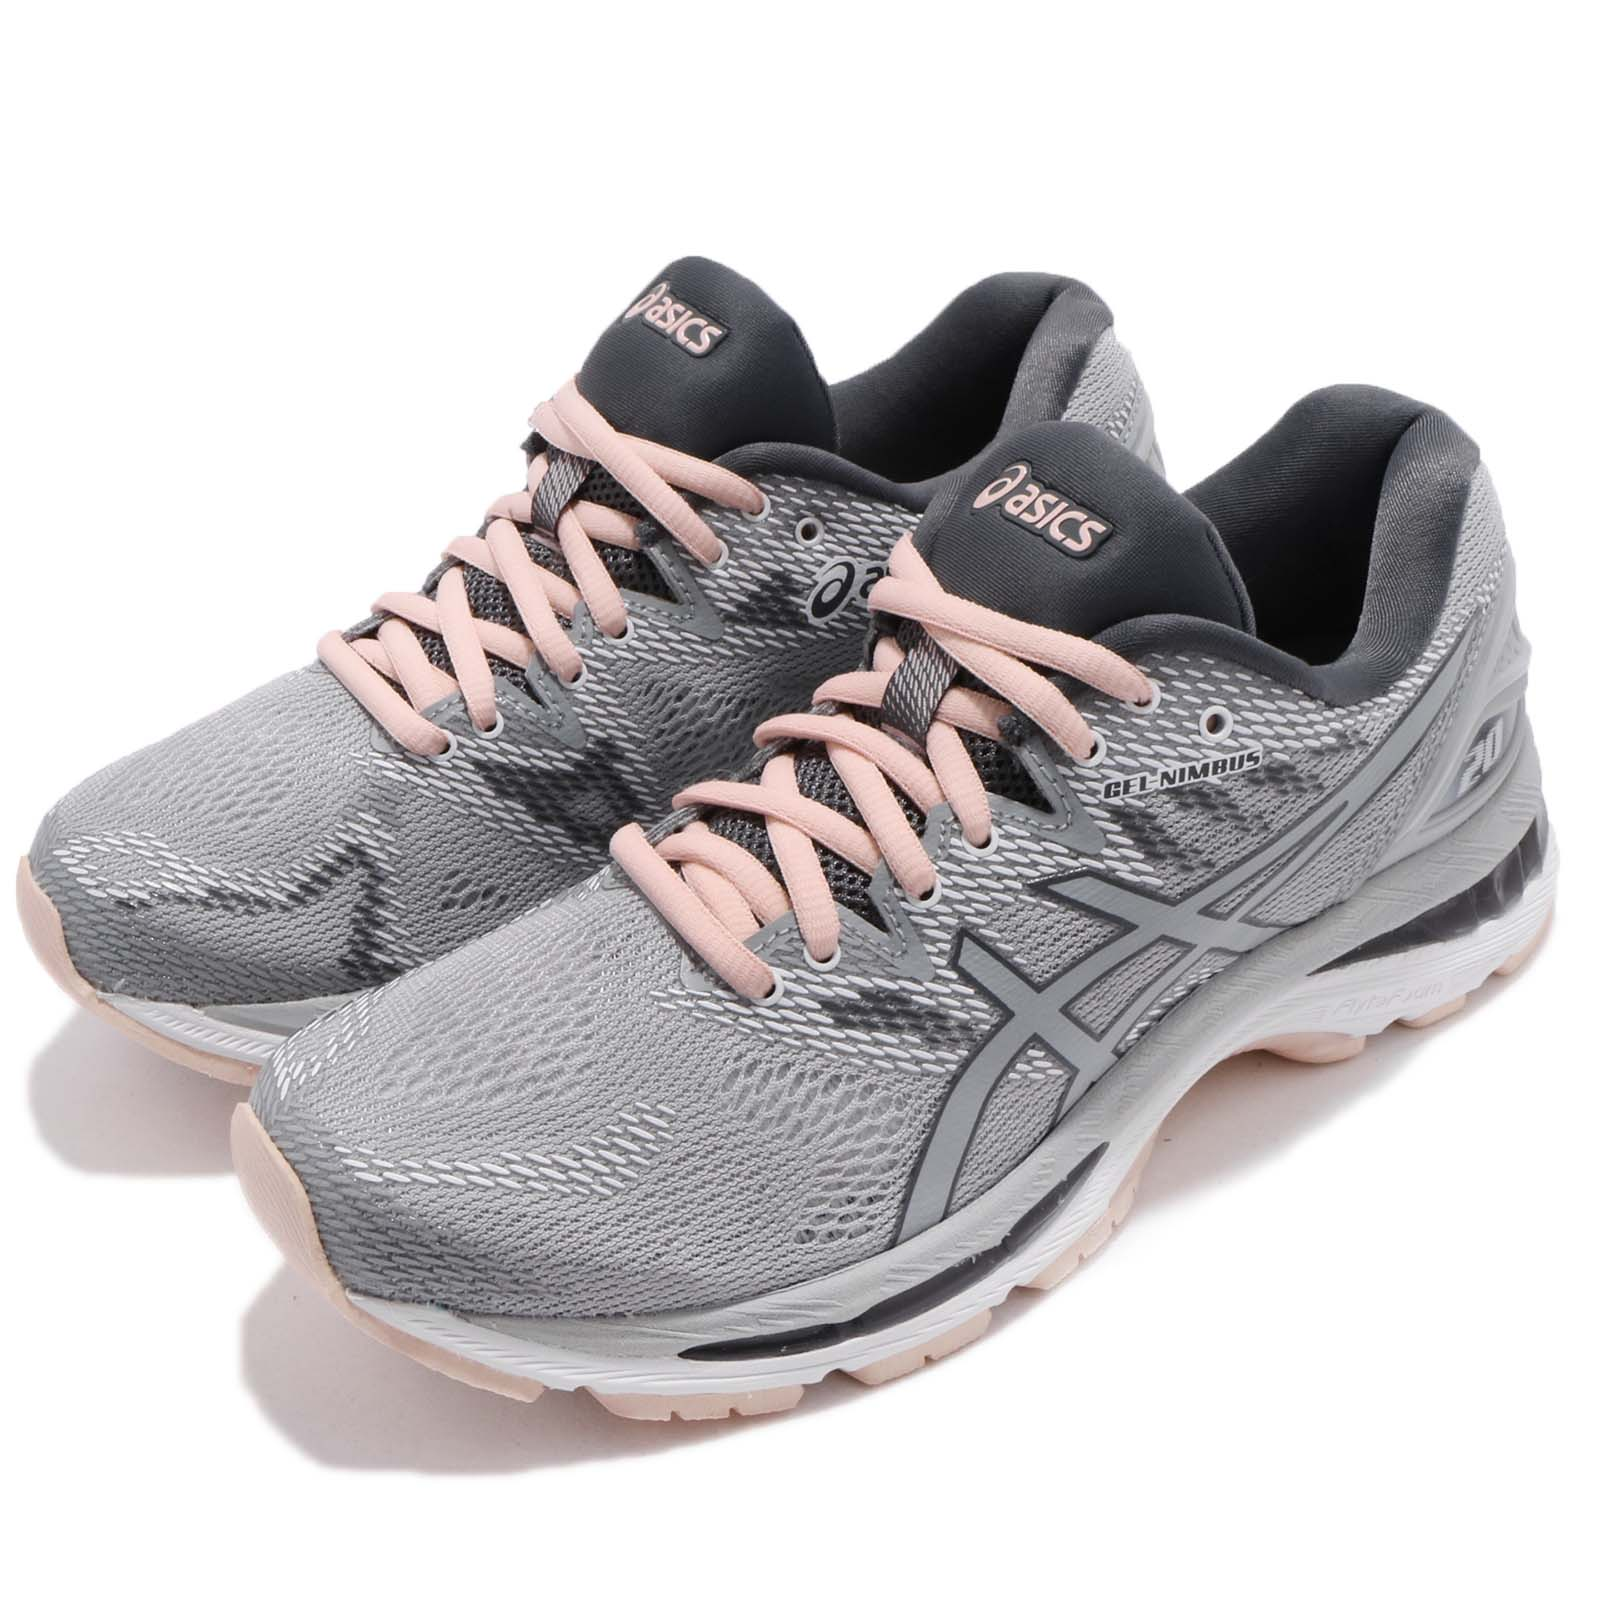 Sneakers Asics Nimbus Gear 20 Women Pink Road Running Shoes 9696 Gel Details About Grey T850n rdChxotsQB